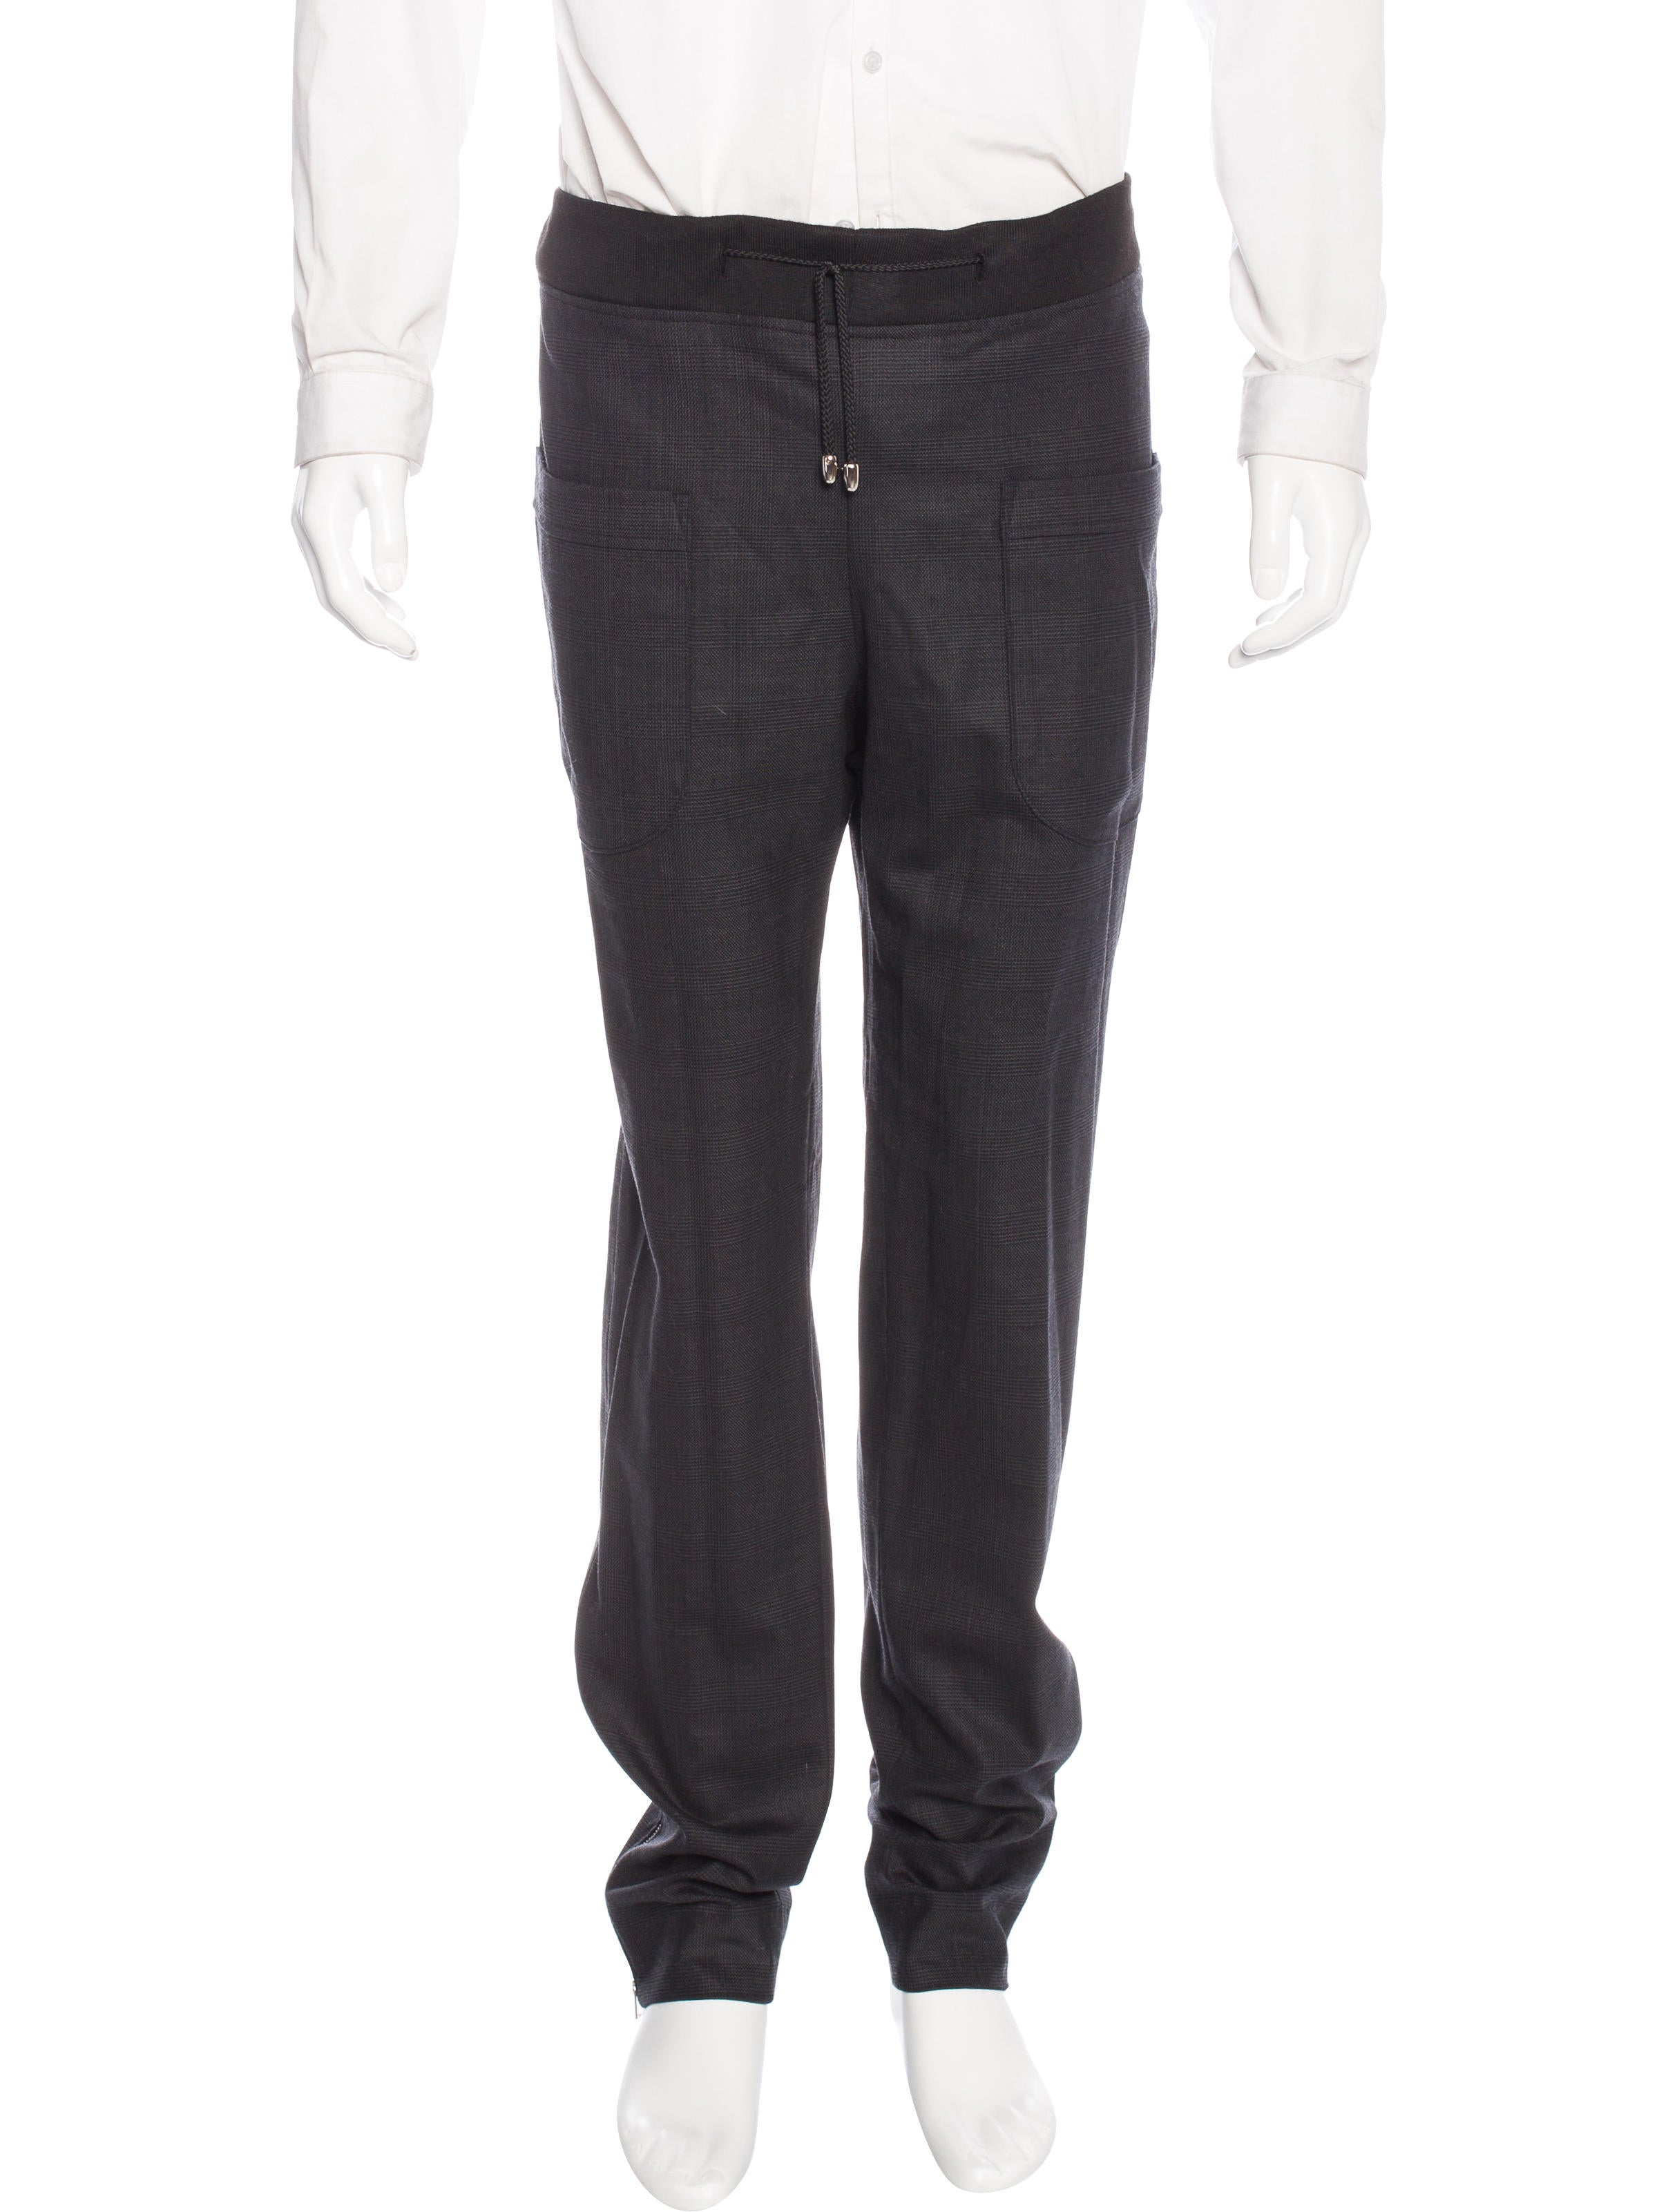 Alba Plaid Jogger Pants - Clothing - WAALB20002   The RealReal